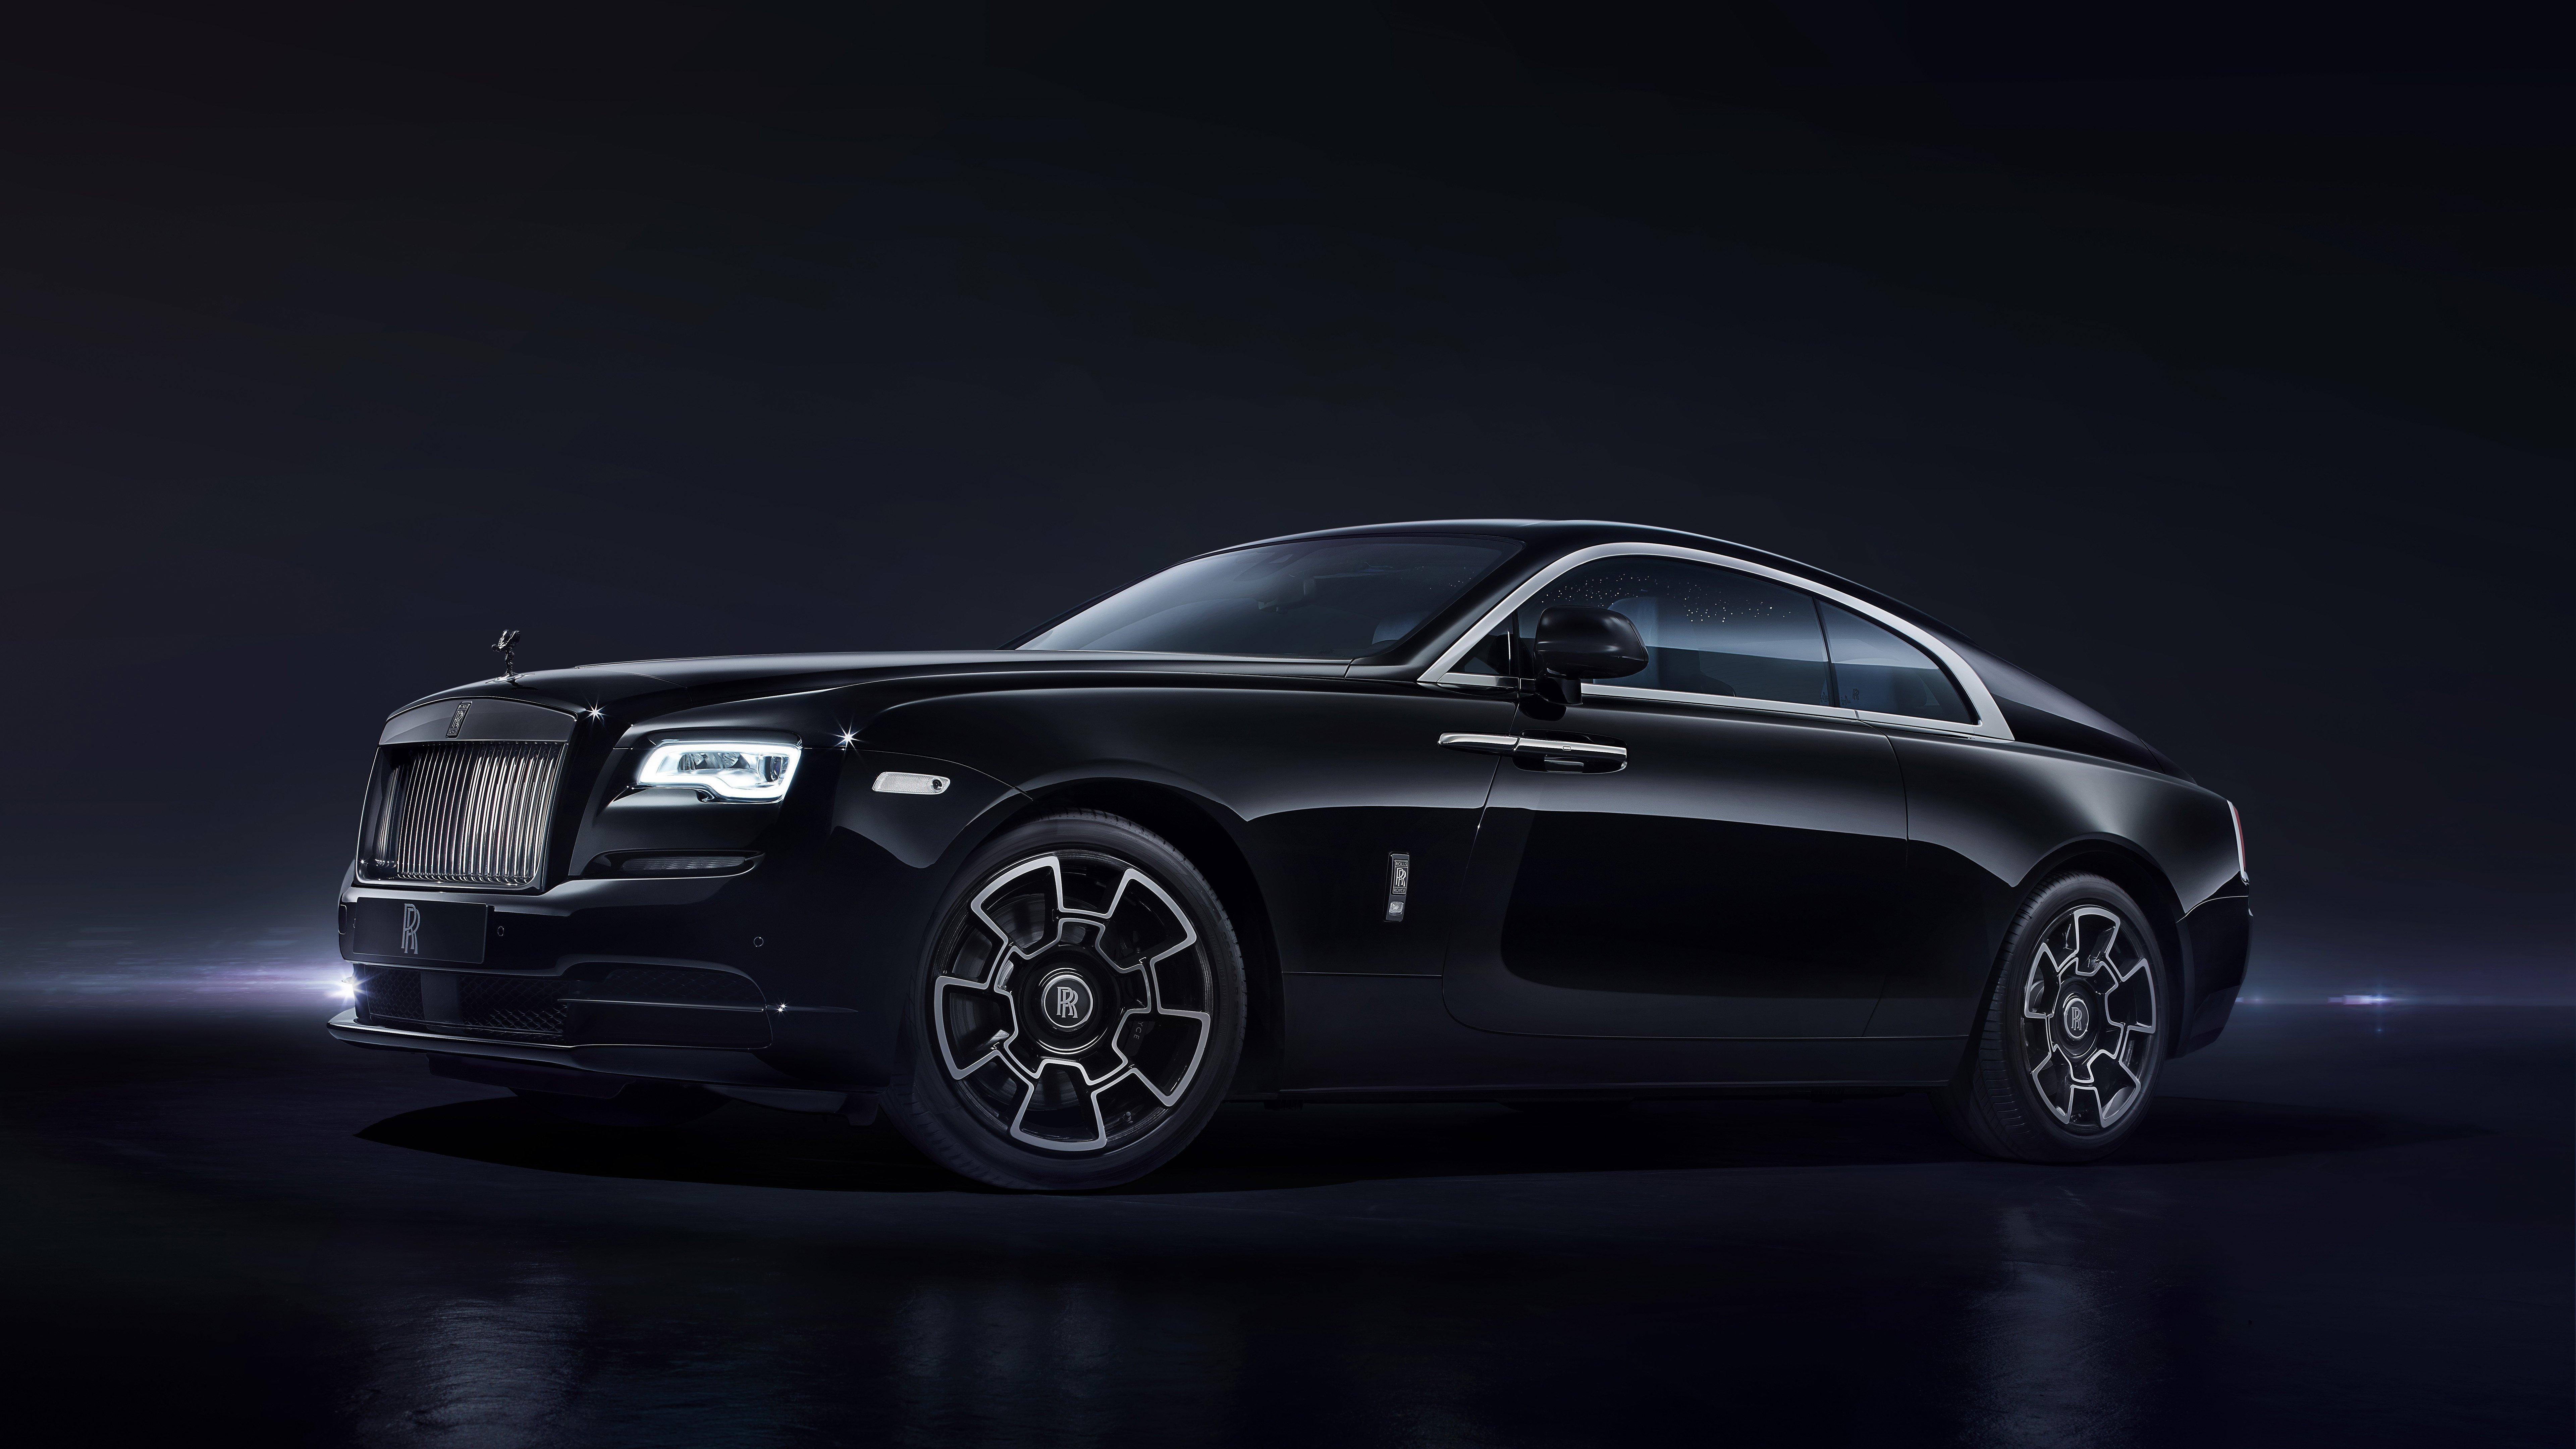 7680x4320 Rolls Royce Black 2017 8k Hd 4k Wallpapers Images